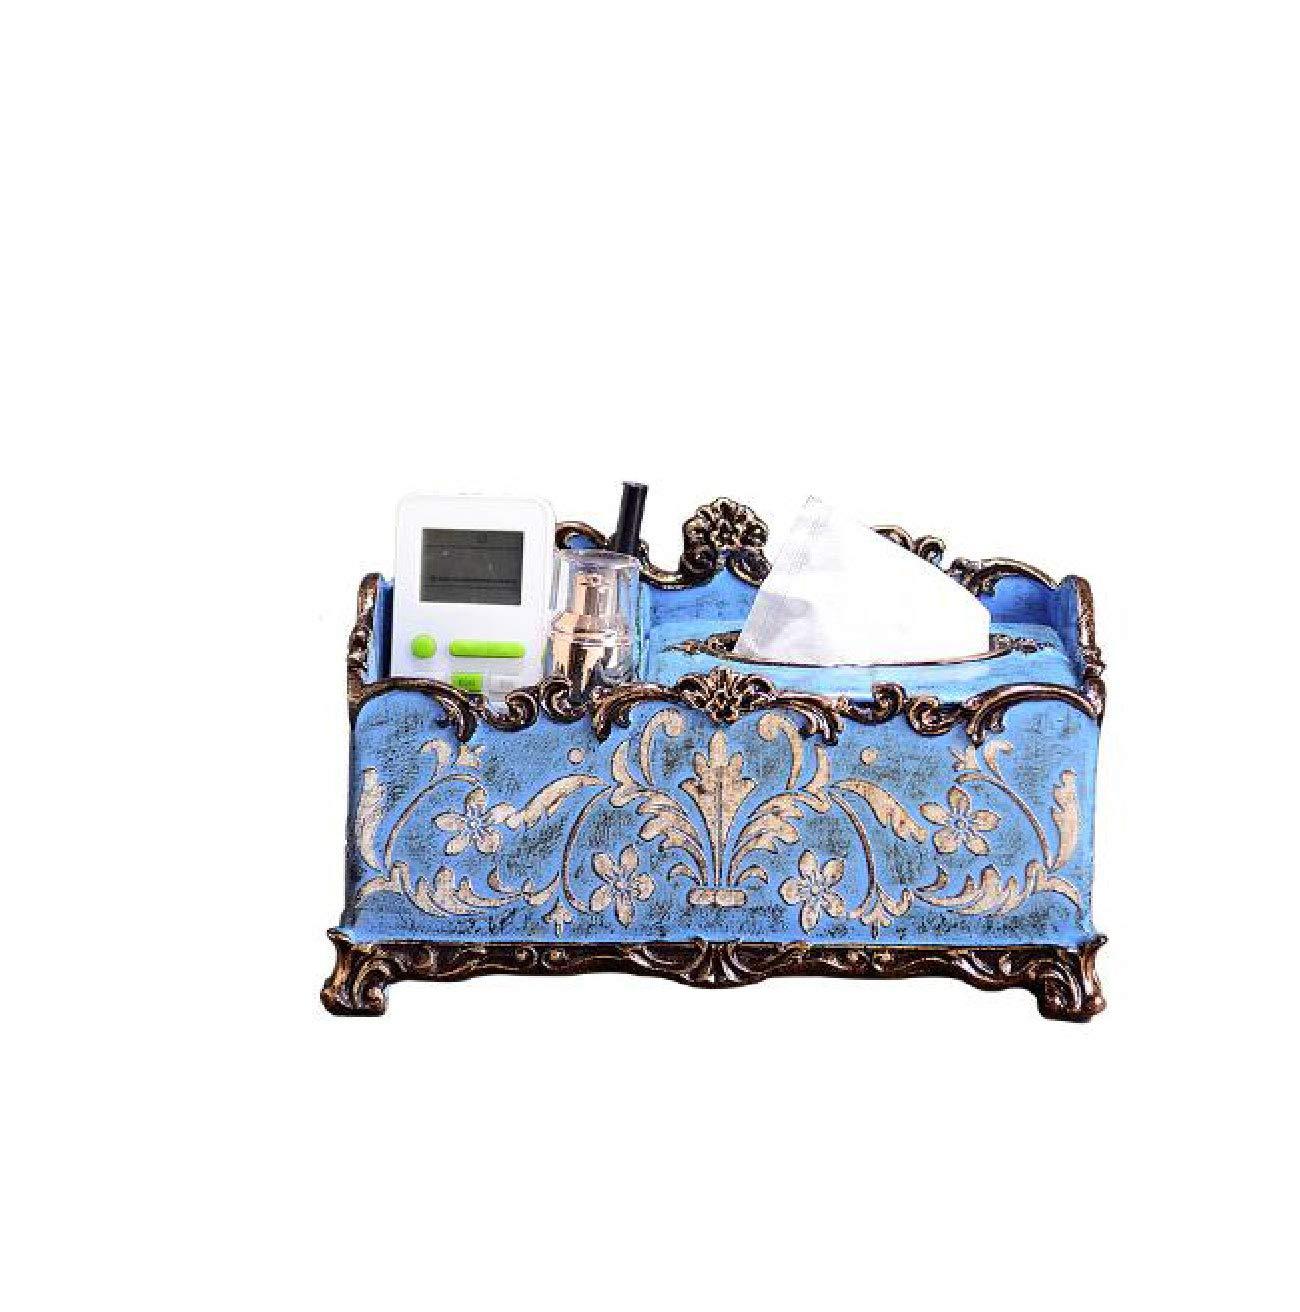 American Retro Embossed Multi-Purpose Tissue Box Creative Fashion high-end Home Coffee Table Storage Box Decorative Ornaments by Ertry